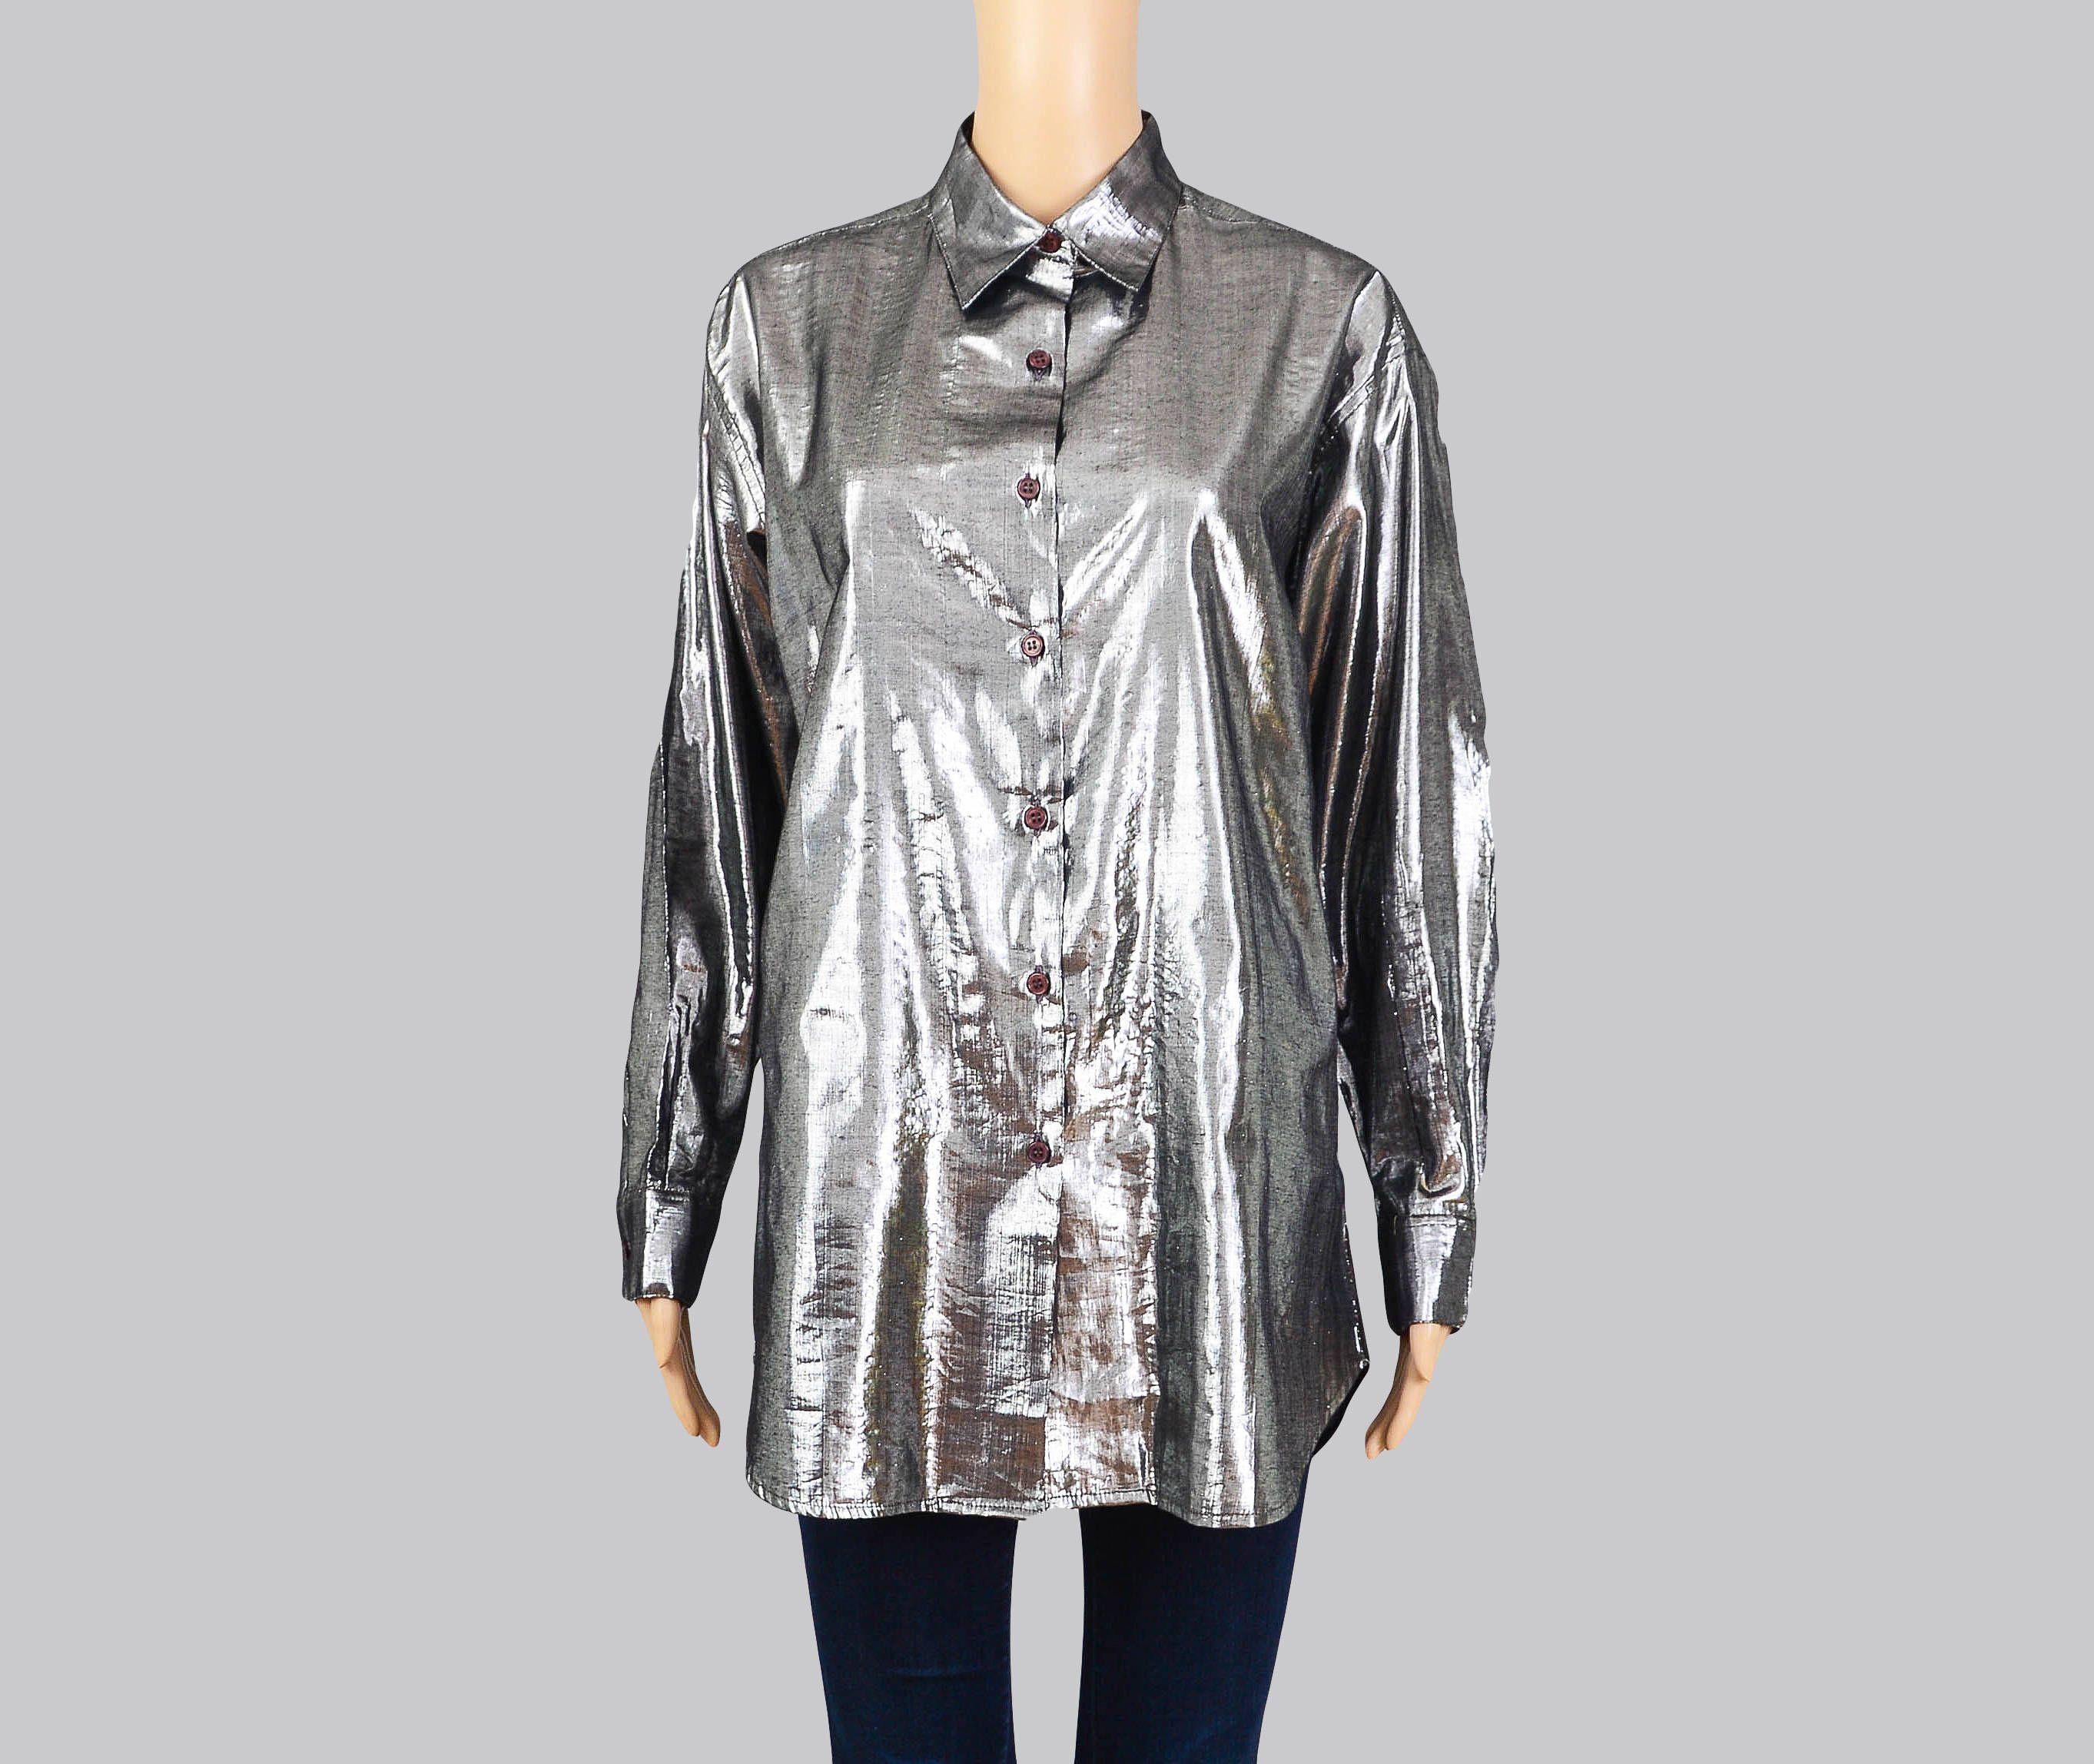 Vintage 90s ESPRIT Shirt   Metallic Silver Shirt   Long Sleeve Collared Button Up Blouse   Lurex Top   Shiny Gray Gunmetal   Medium M by SHOPPOMPOMVINTAGE on Etsy